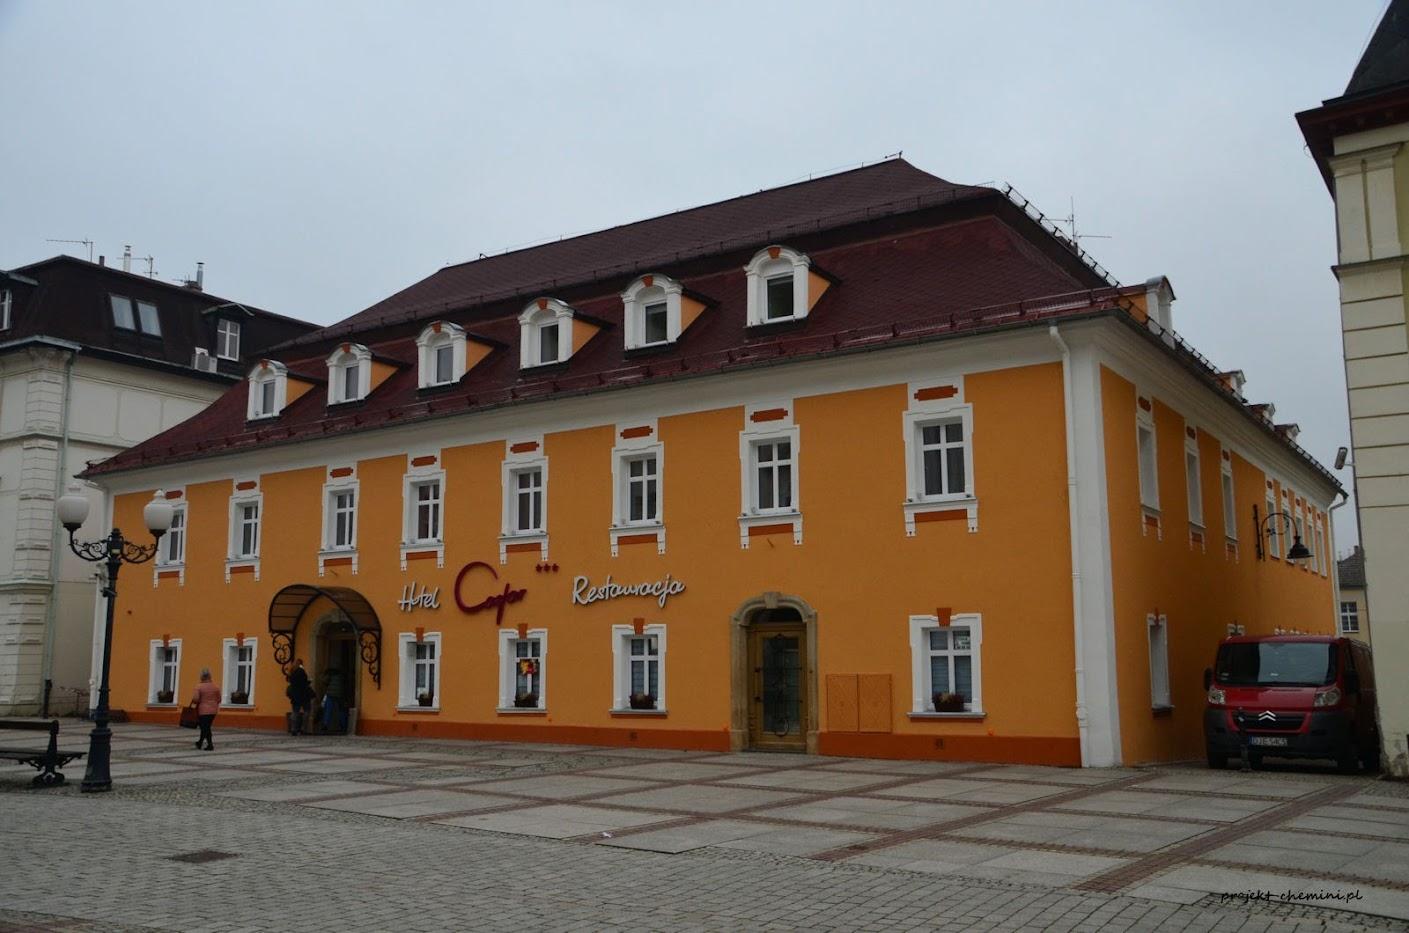 Plac Piastowski - Hotel Caspar